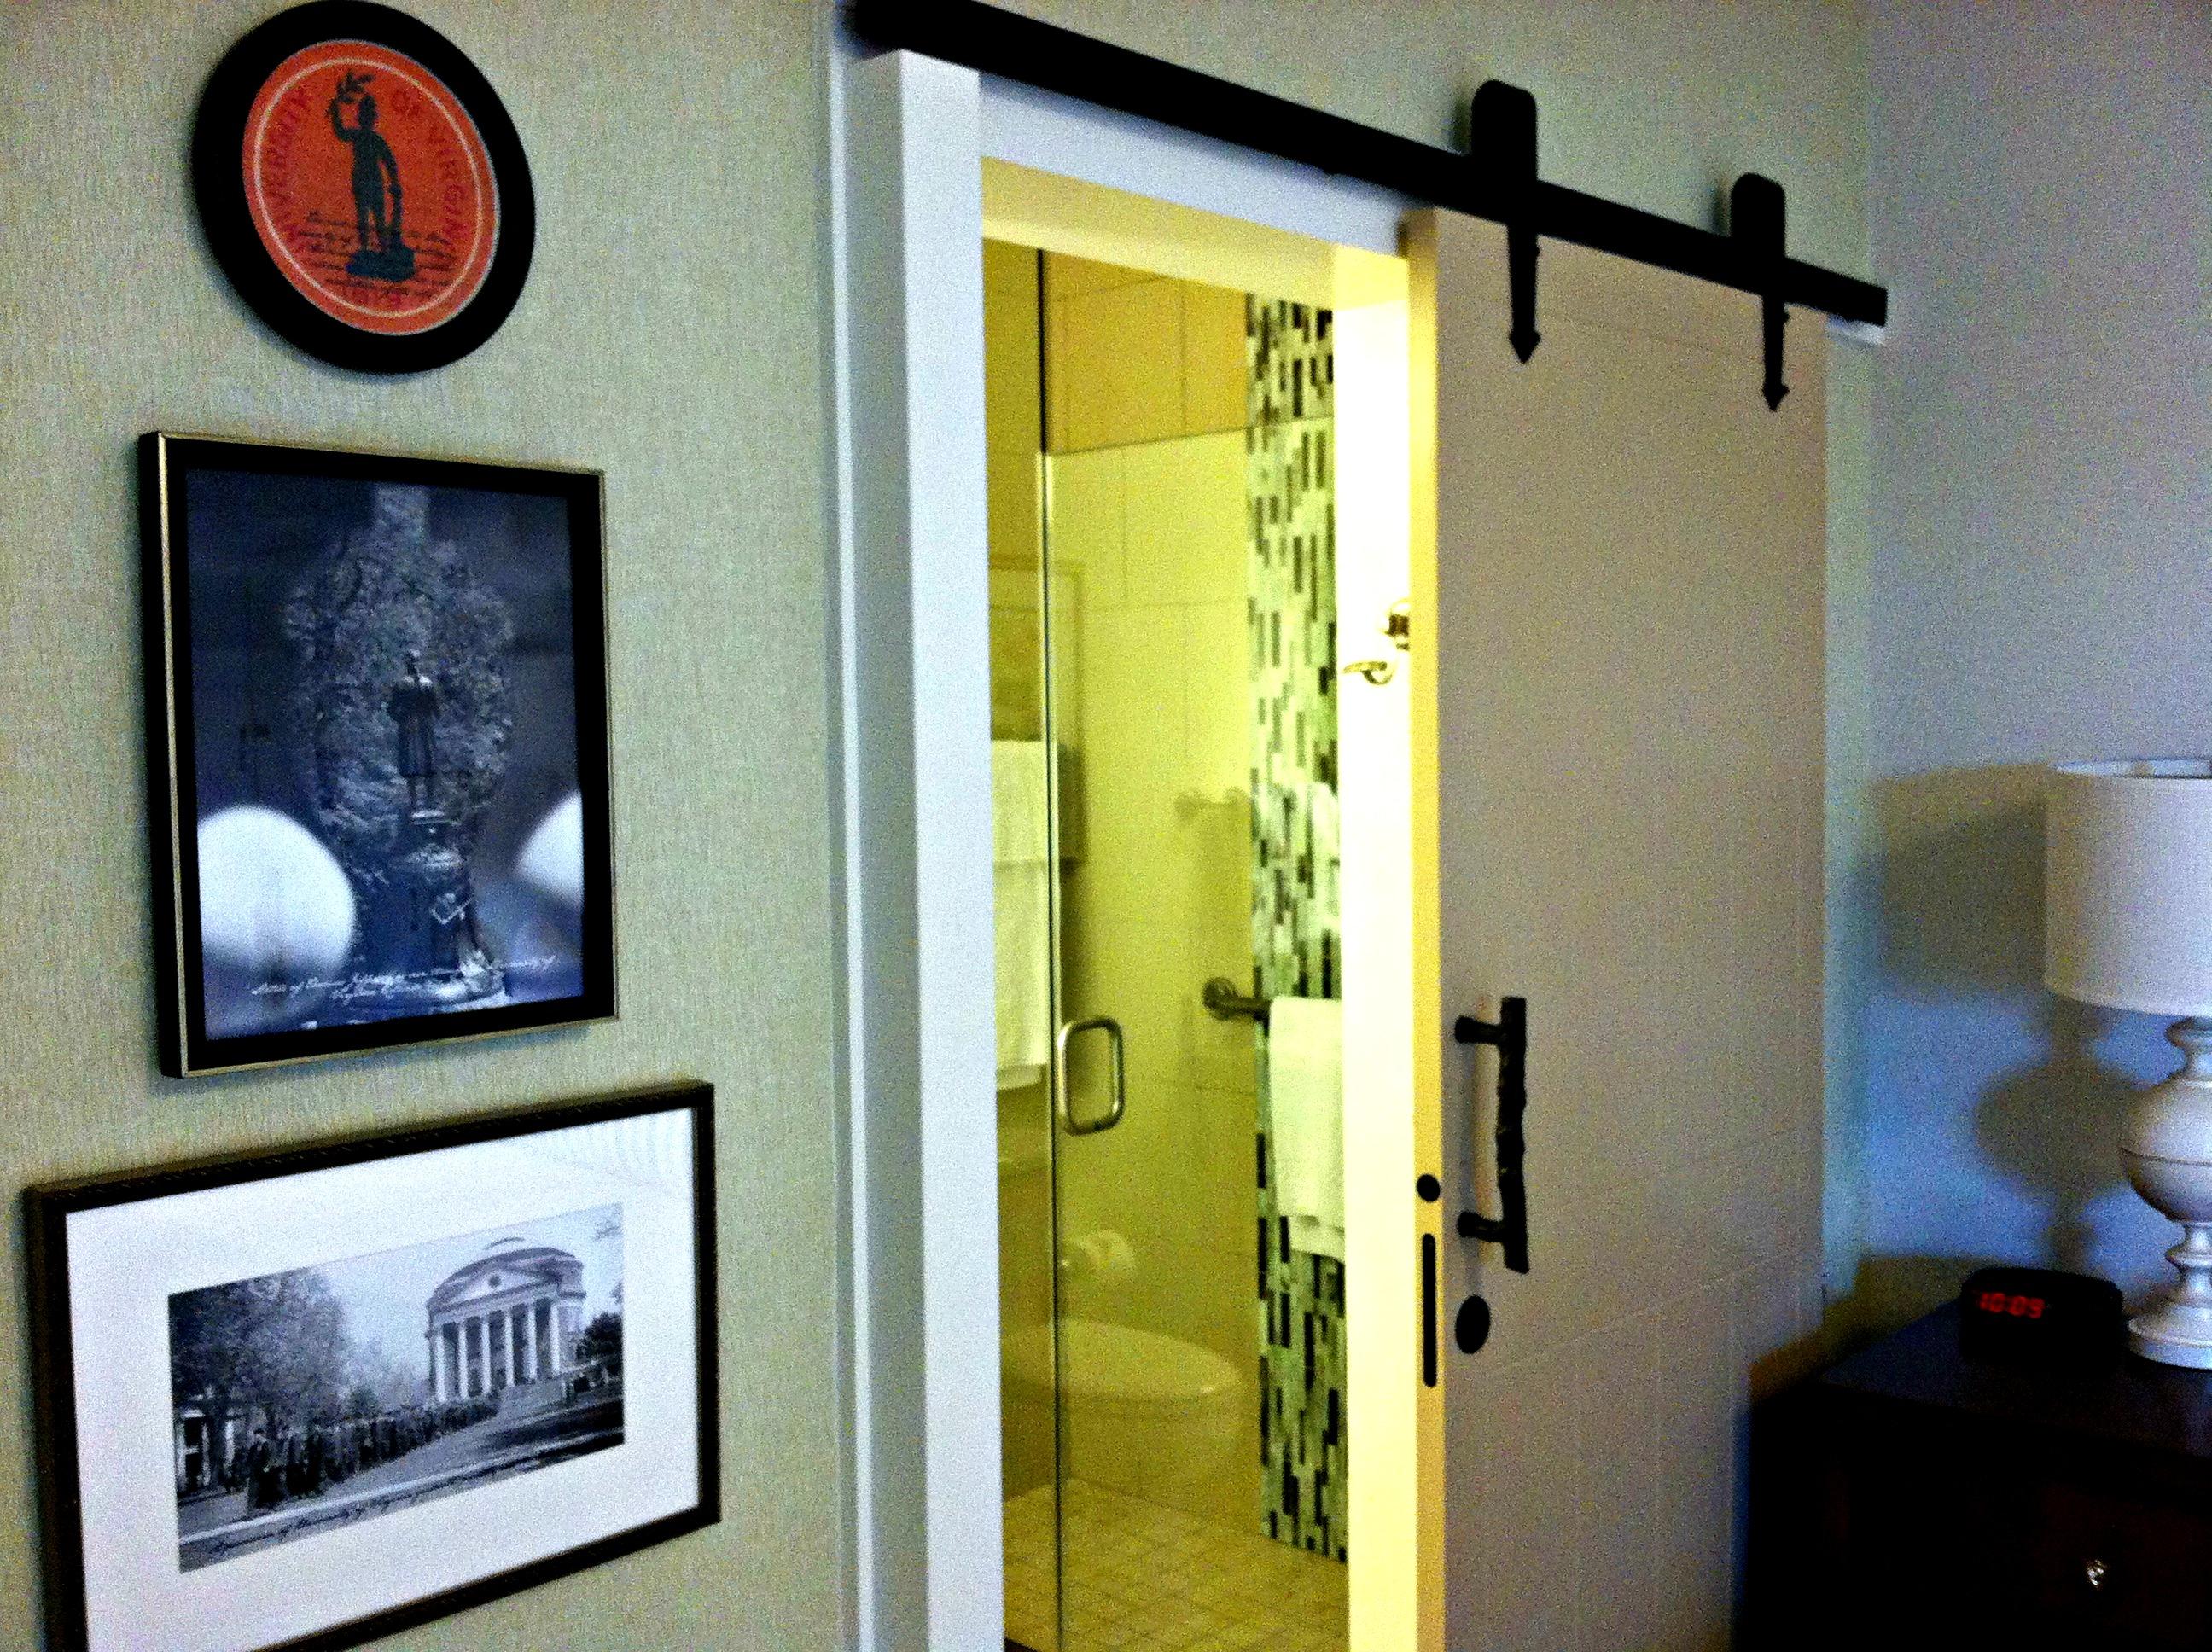 Boar's Head Bathroom Door